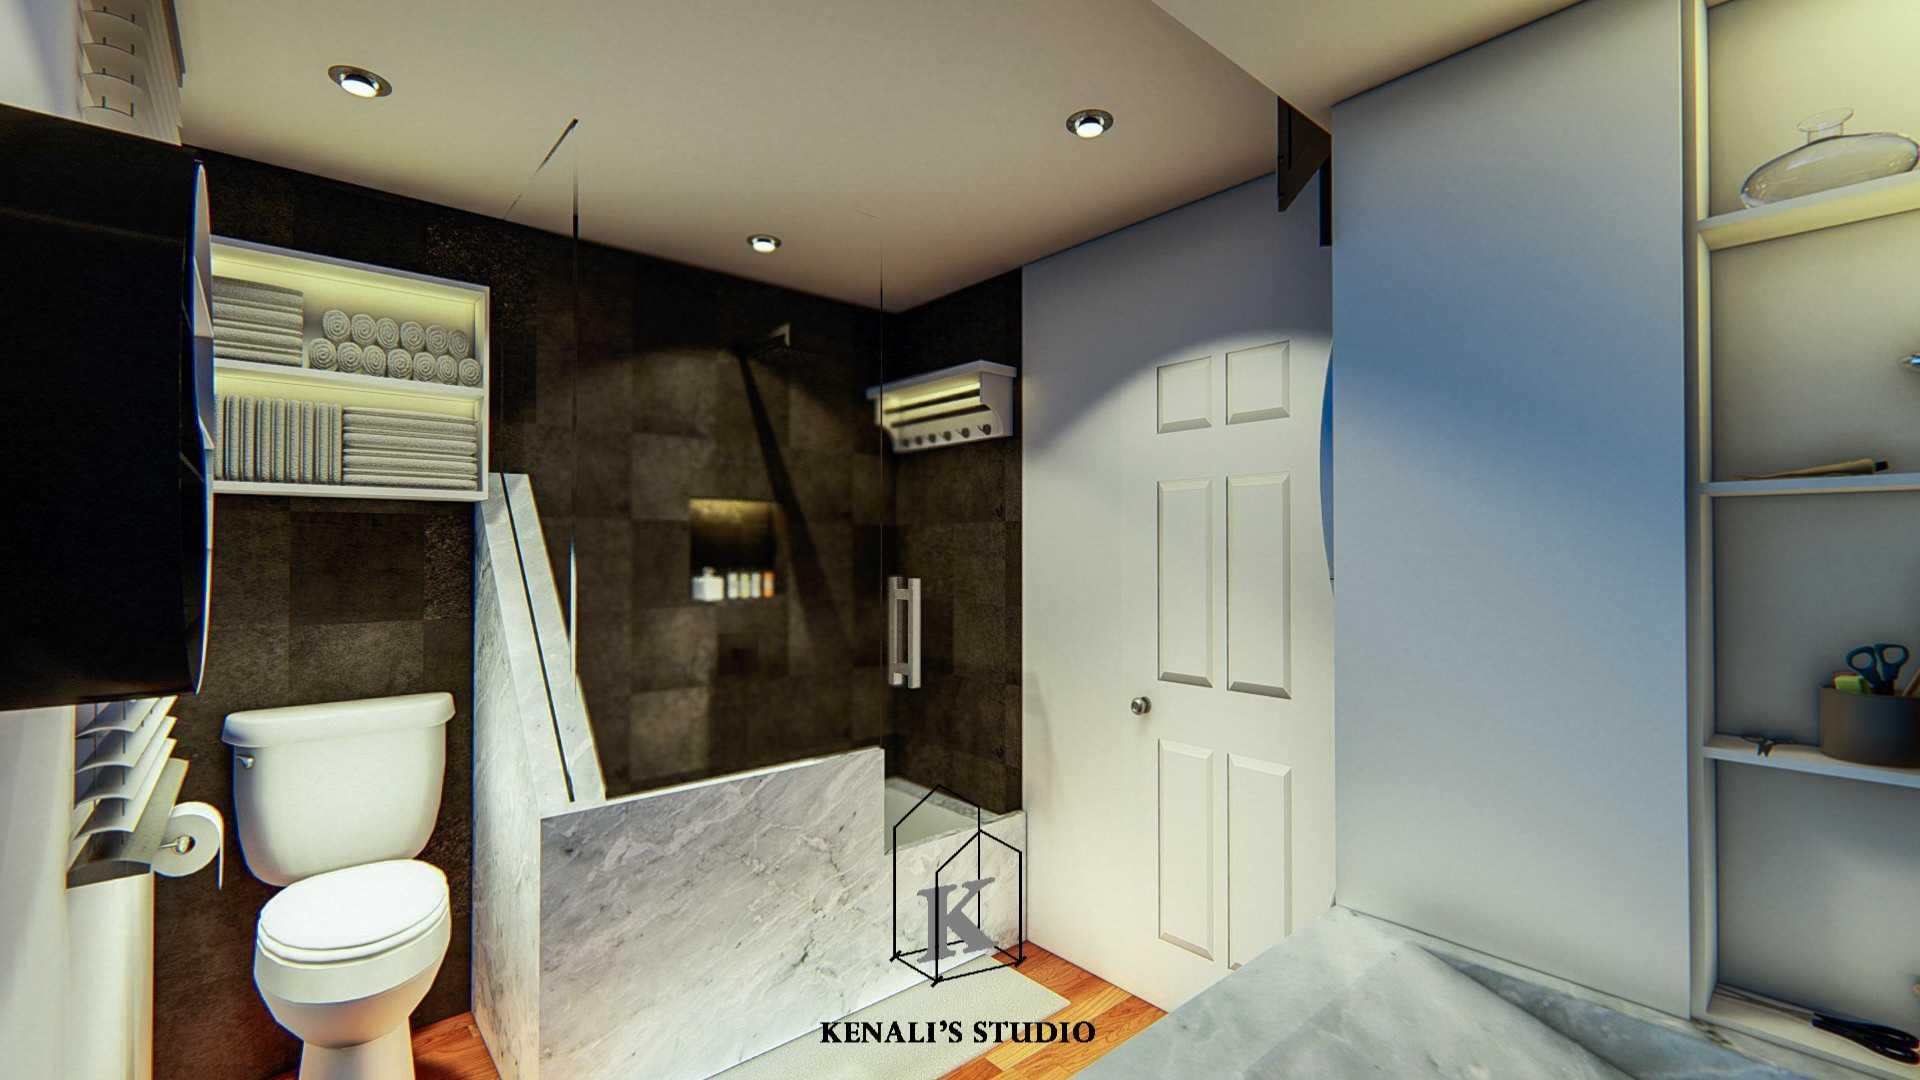 Kenali's Studio Project : Laundry & Bathroom Amerika Serikat Amerika Serikat Kenalis-Studio-Project-Laundry-Bathroom  72915